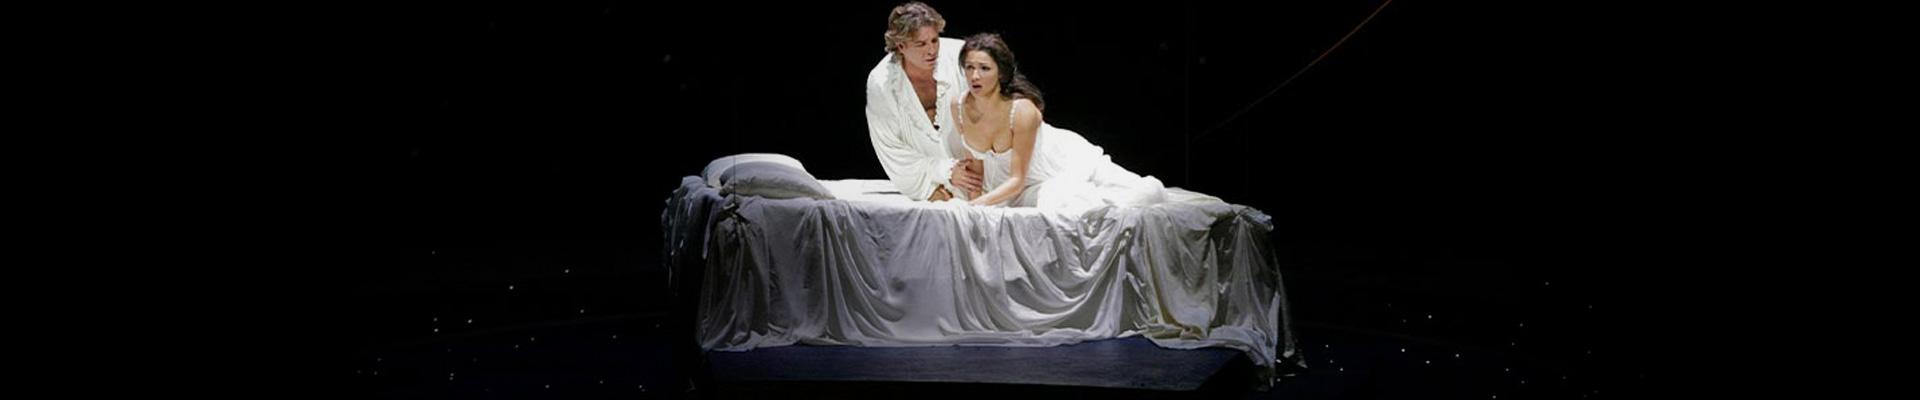 Nightly Opera Stream Roméo et Juliette